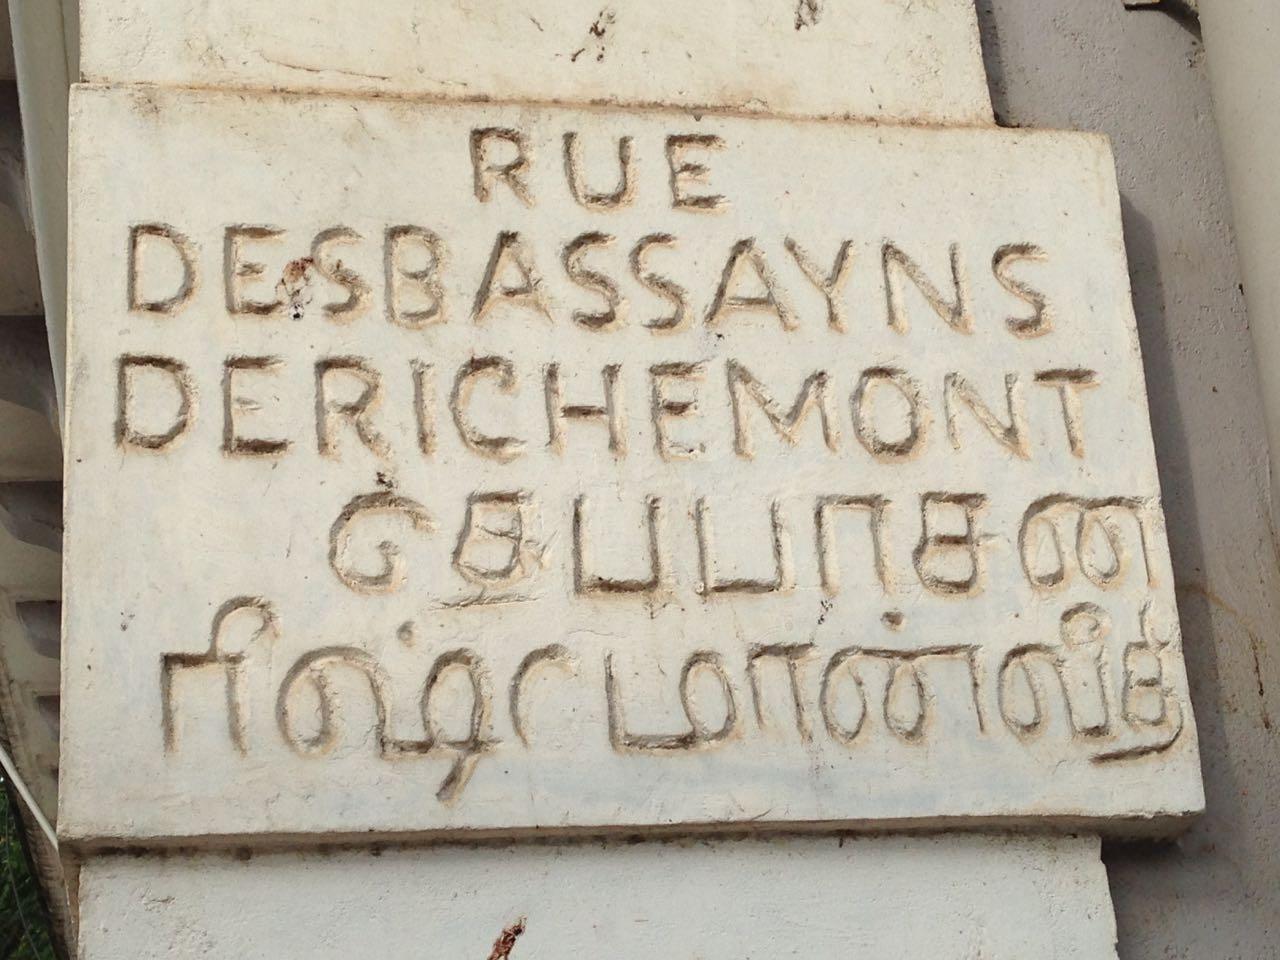 rue Desbassayns de Richemont